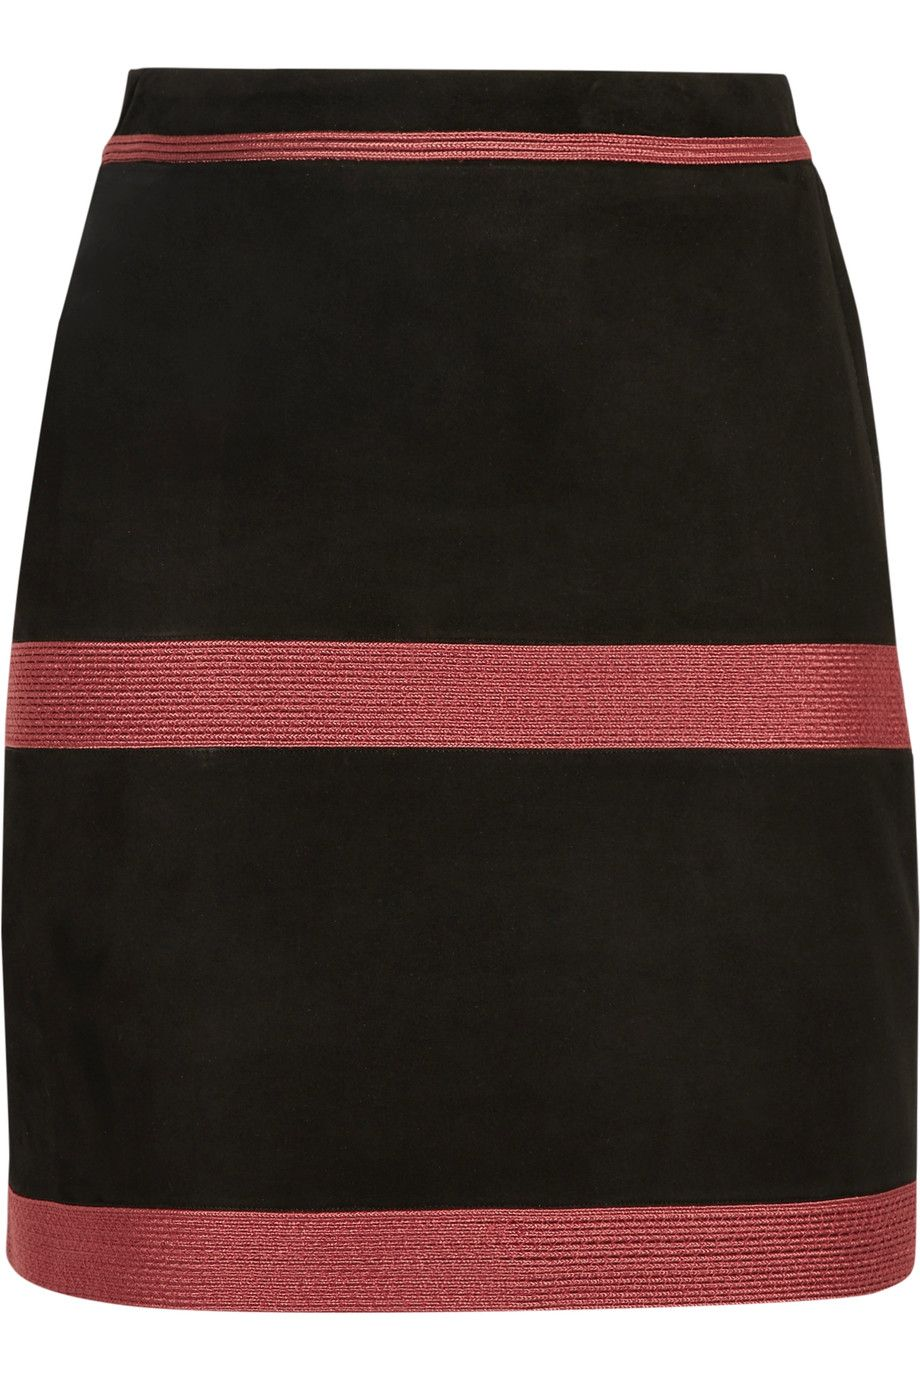 ZEUS+DIONE Zephyr Embroidered Suede Mini Skirt. #zeus+dione #cloth #